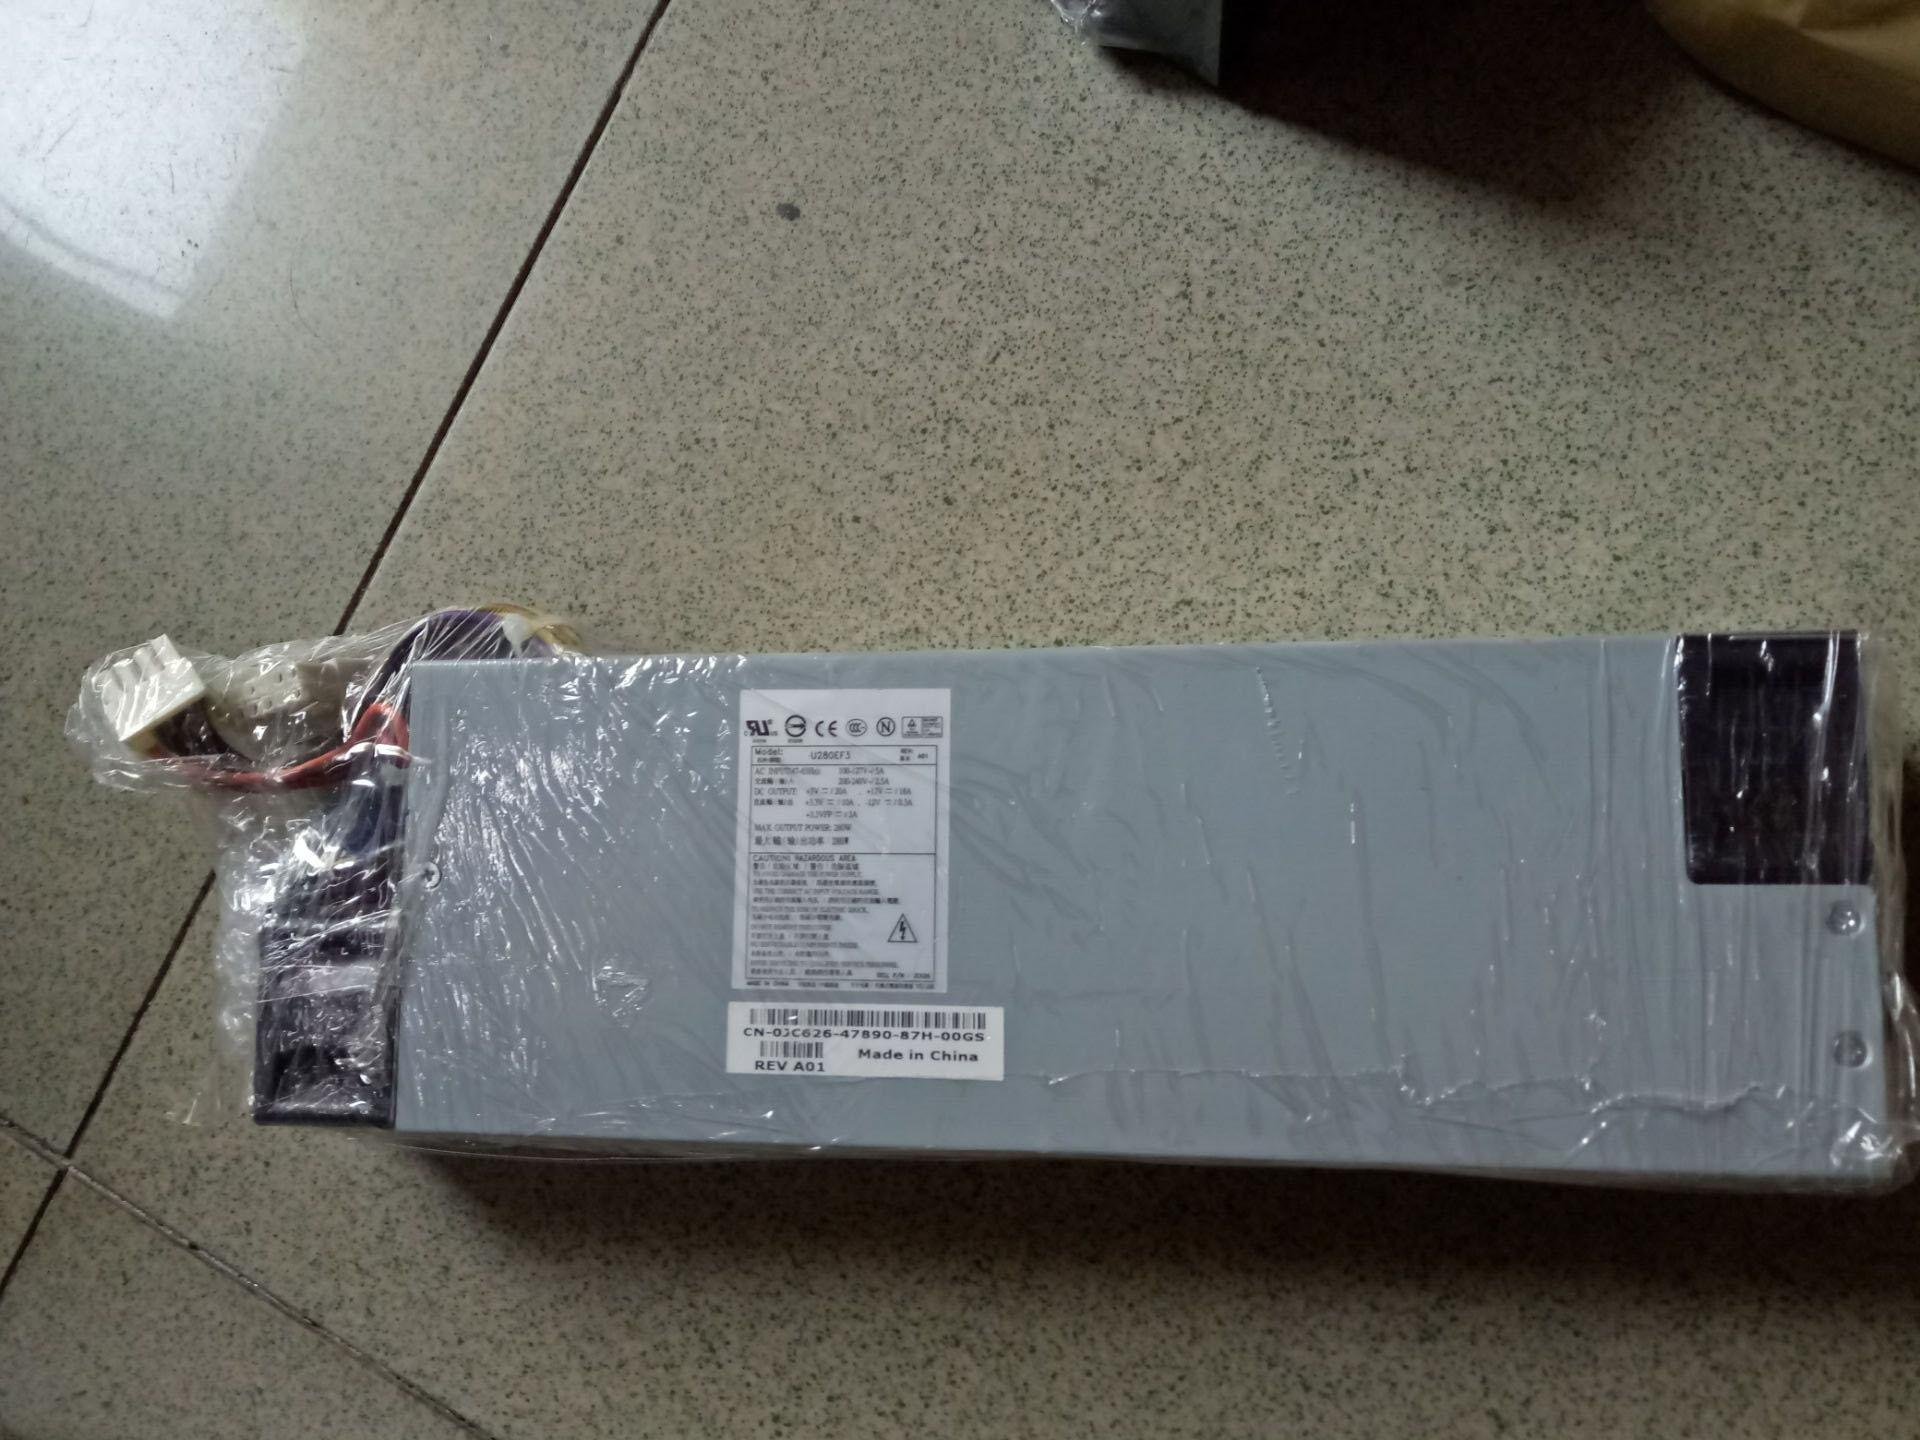 PE750 server power supply U280EF3 W5916 P8823 F1265